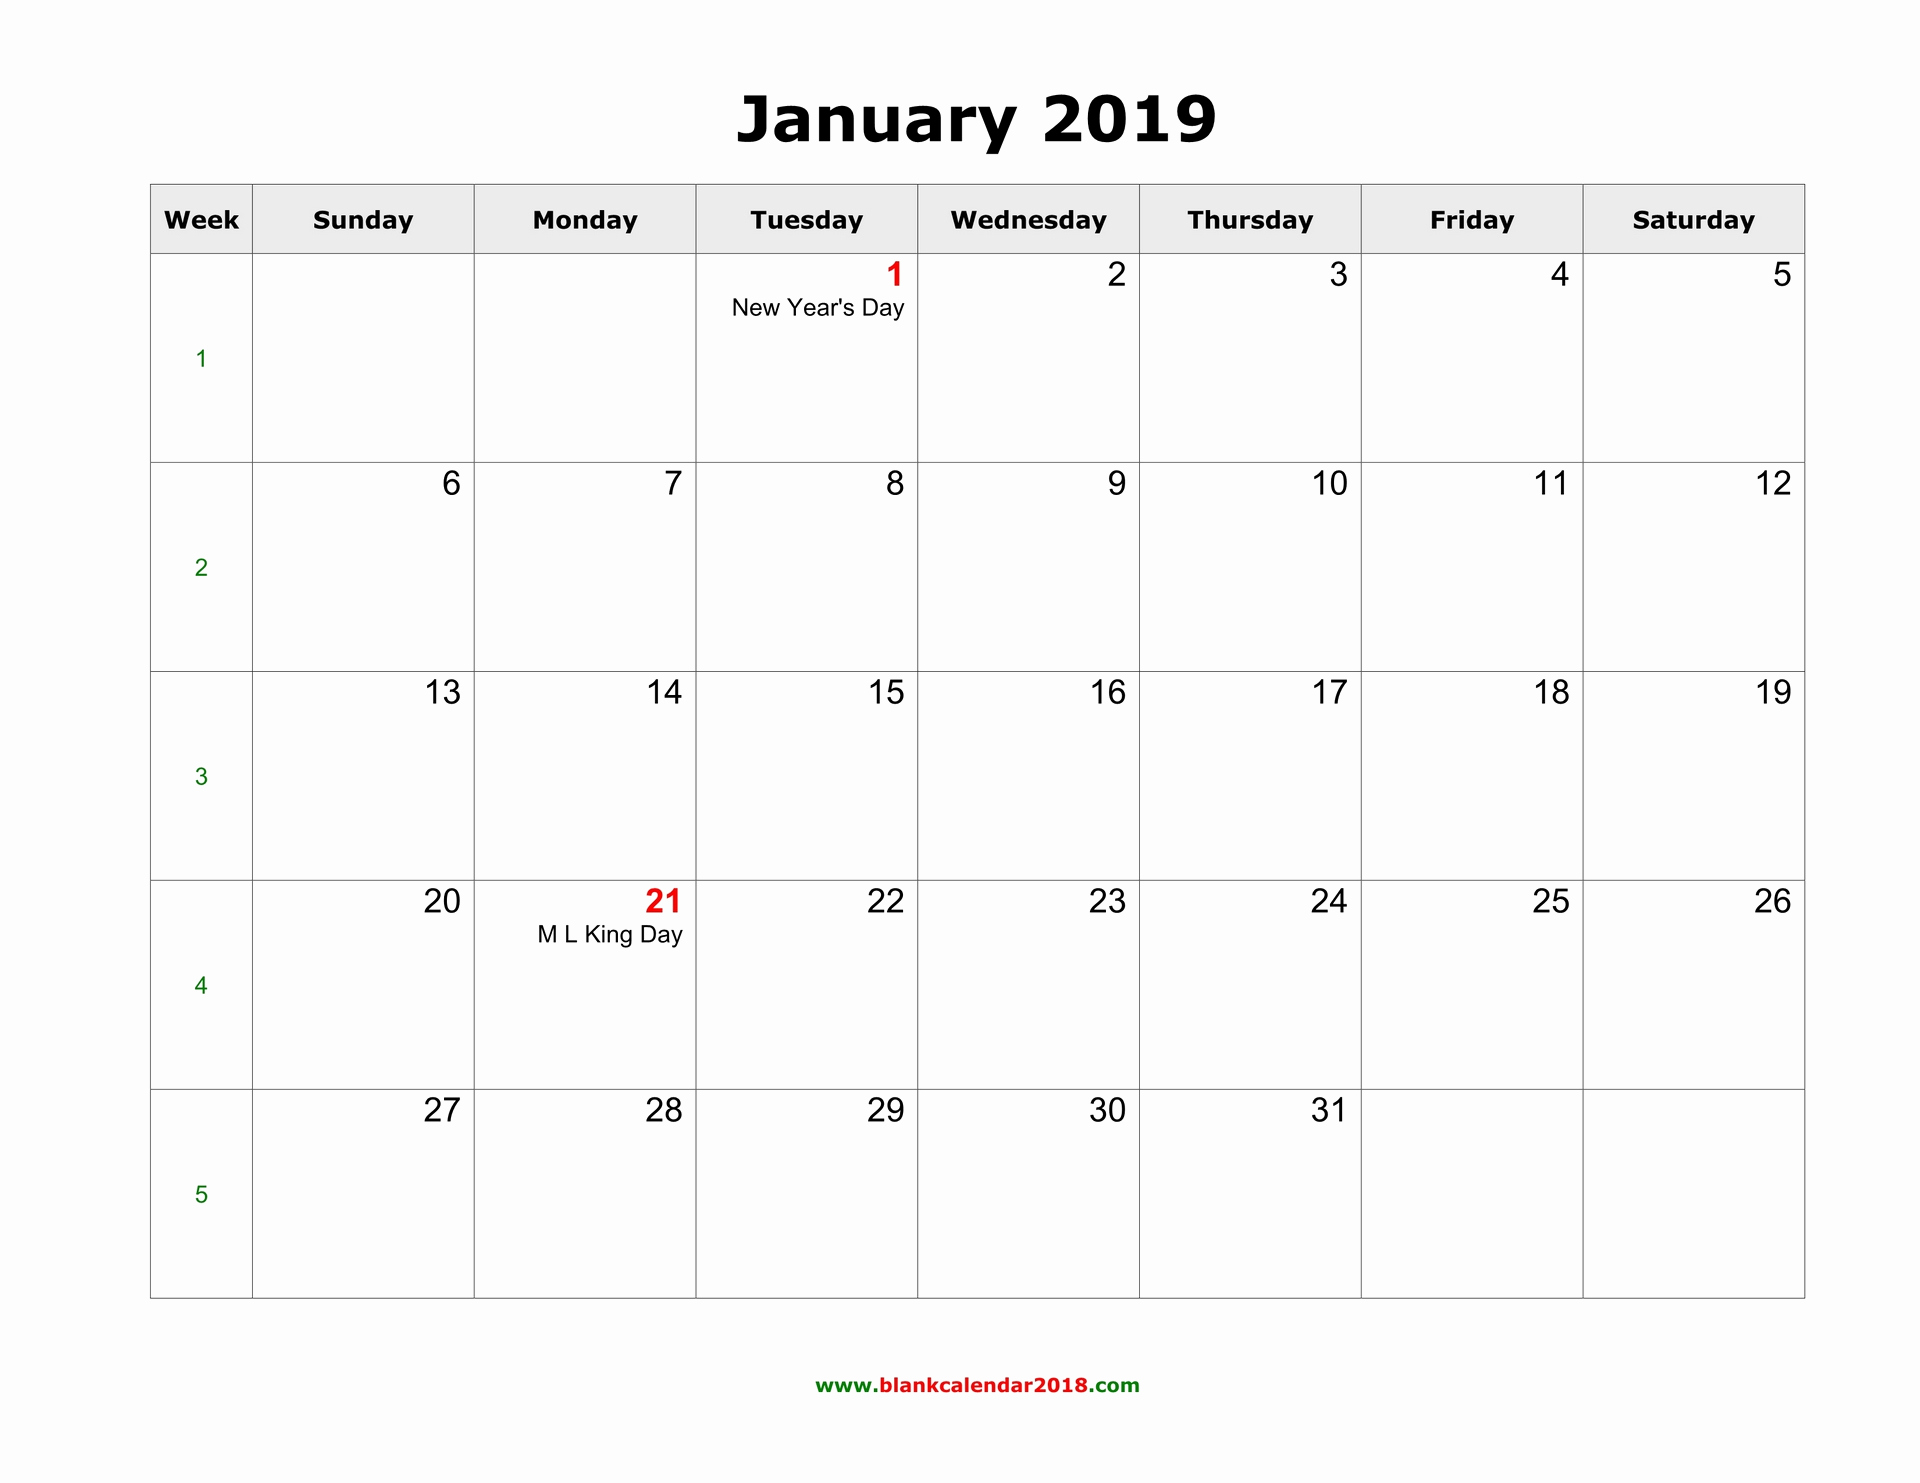 2019 Calendar Template Word Lovely Printable Calendar 2019 In Word